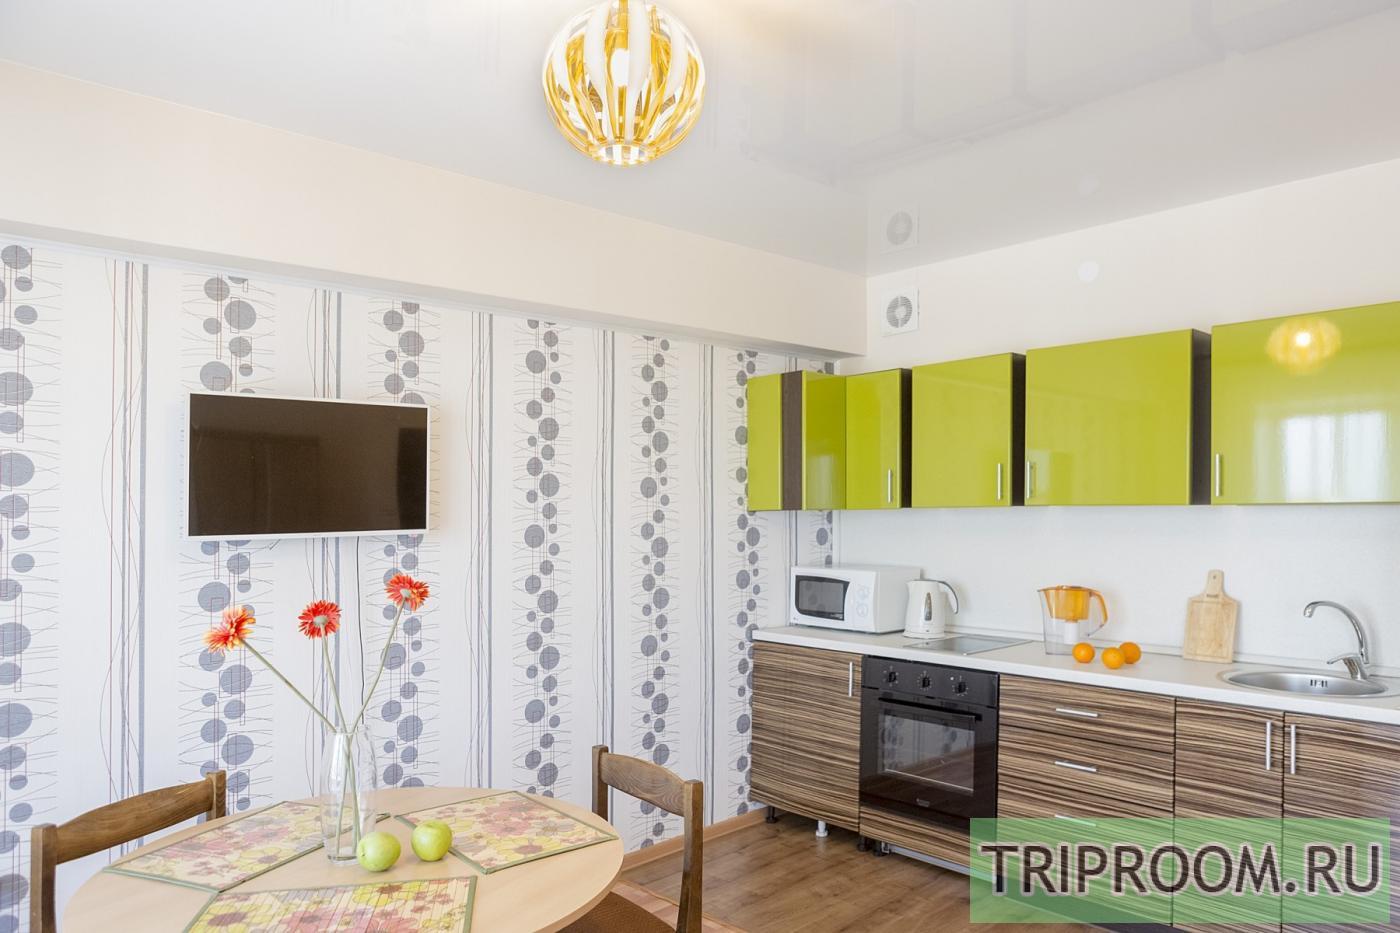 1-комнатная квартира посуточно (вариант № 35709), ул. Ядринцева улица, фото № 6